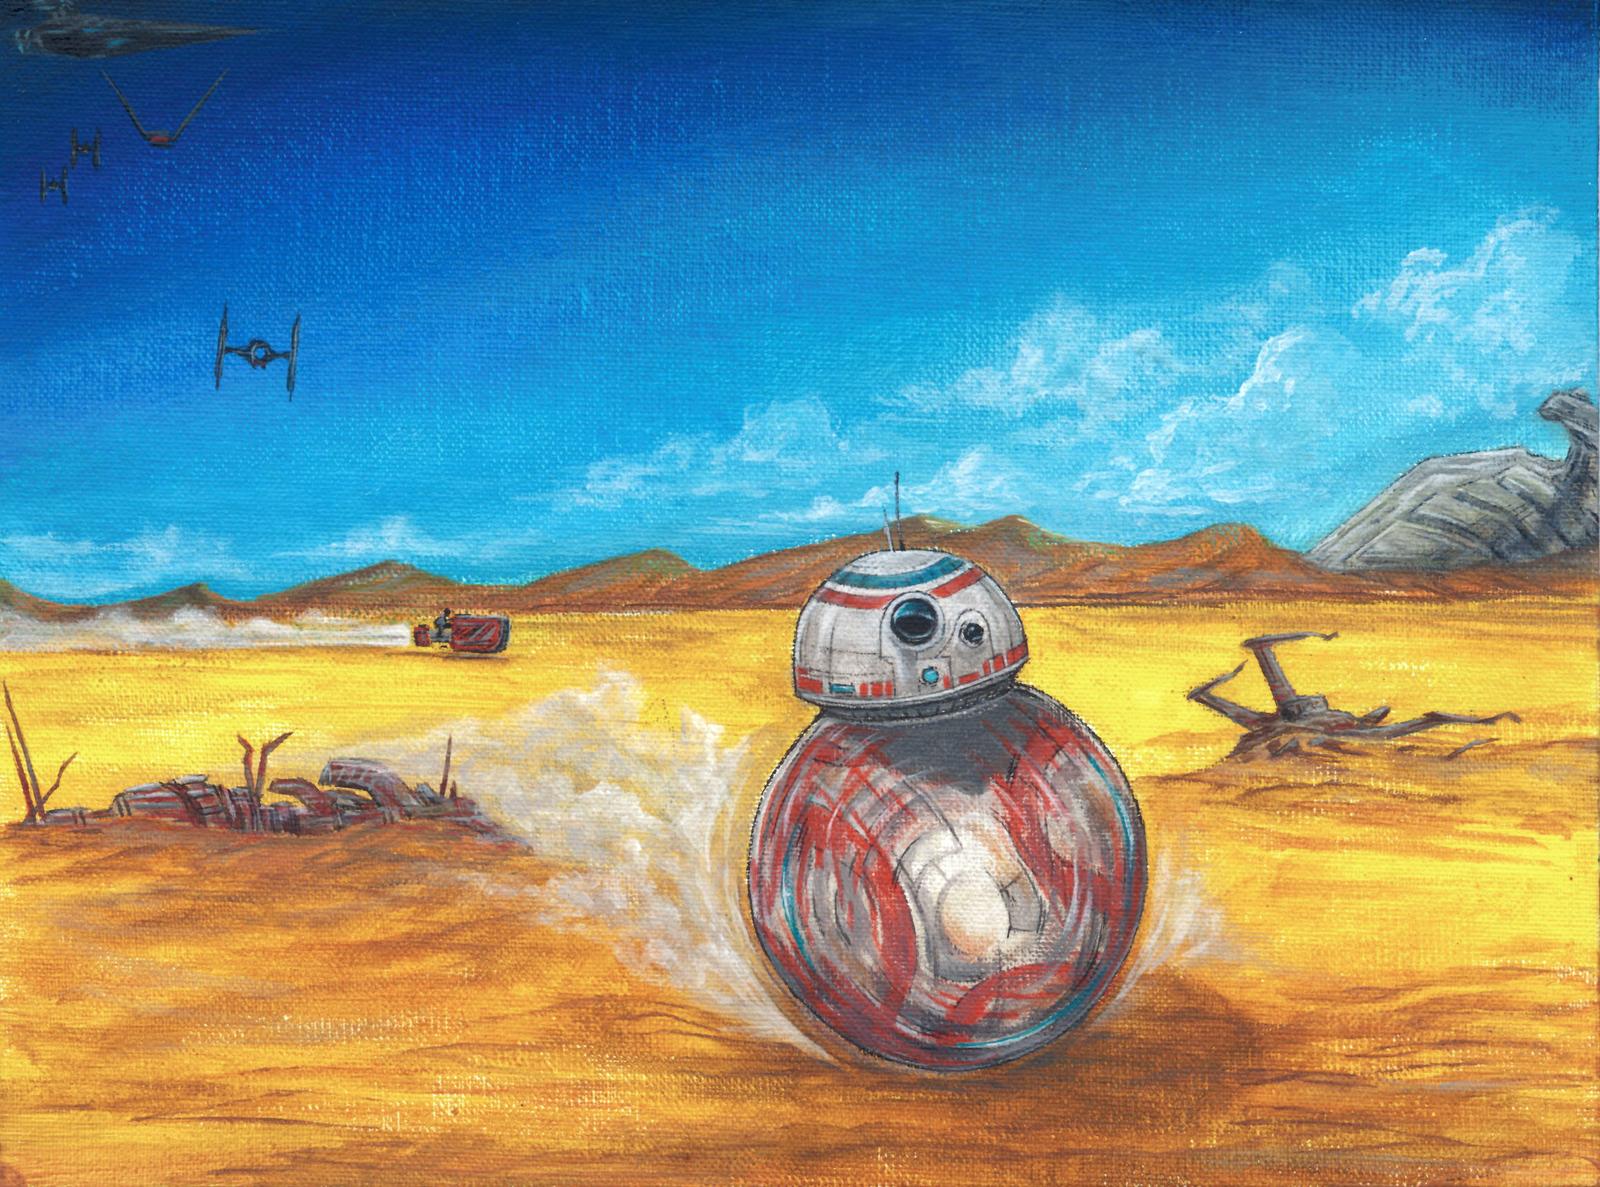 BB-8 by AlexanderCrW